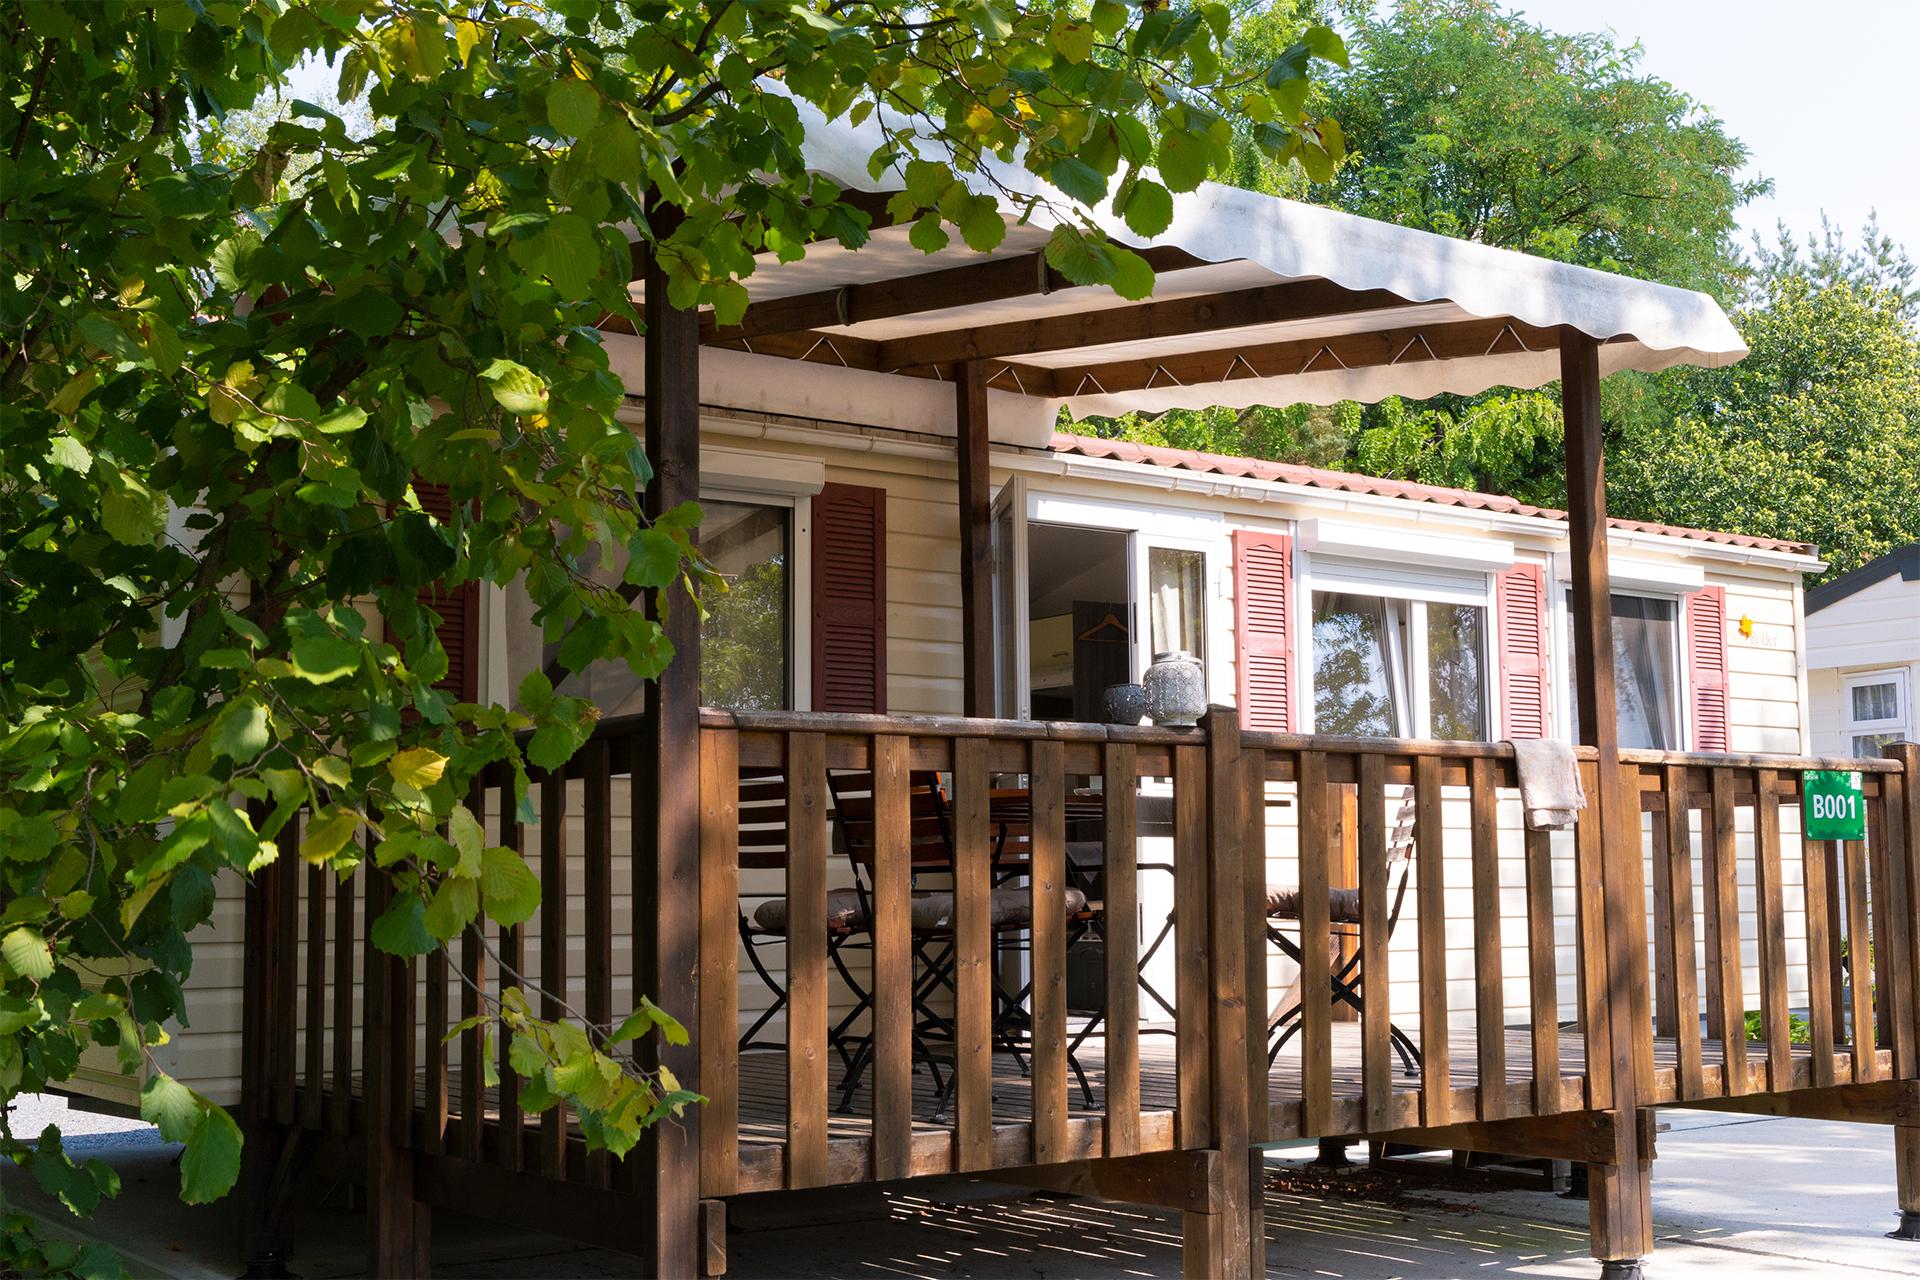 Campingplatz mit Bungalow in Pirna